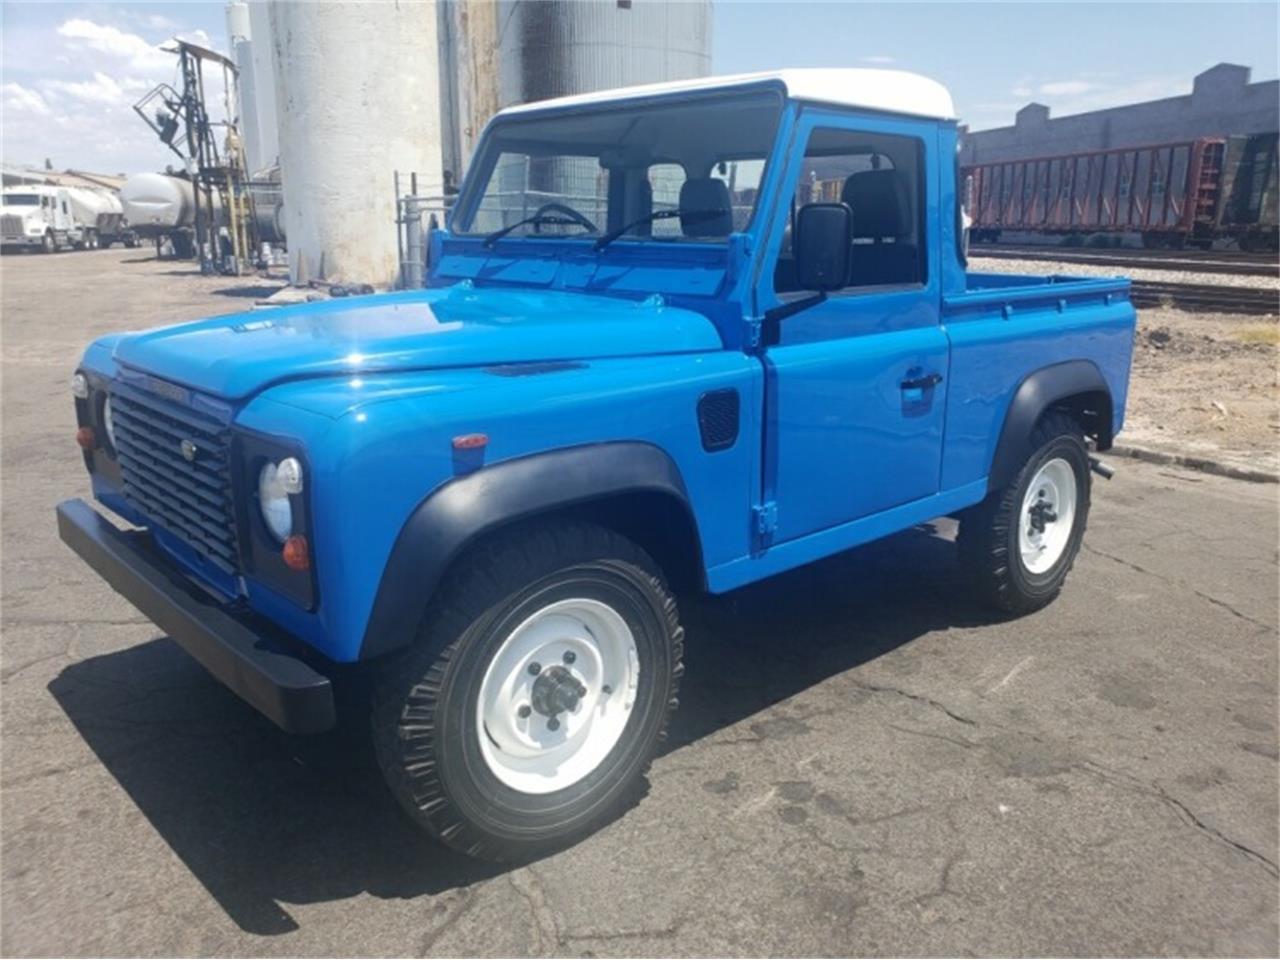 1991 Land Rover Defender (CC-1236900) for sale in Sparks, Nevada